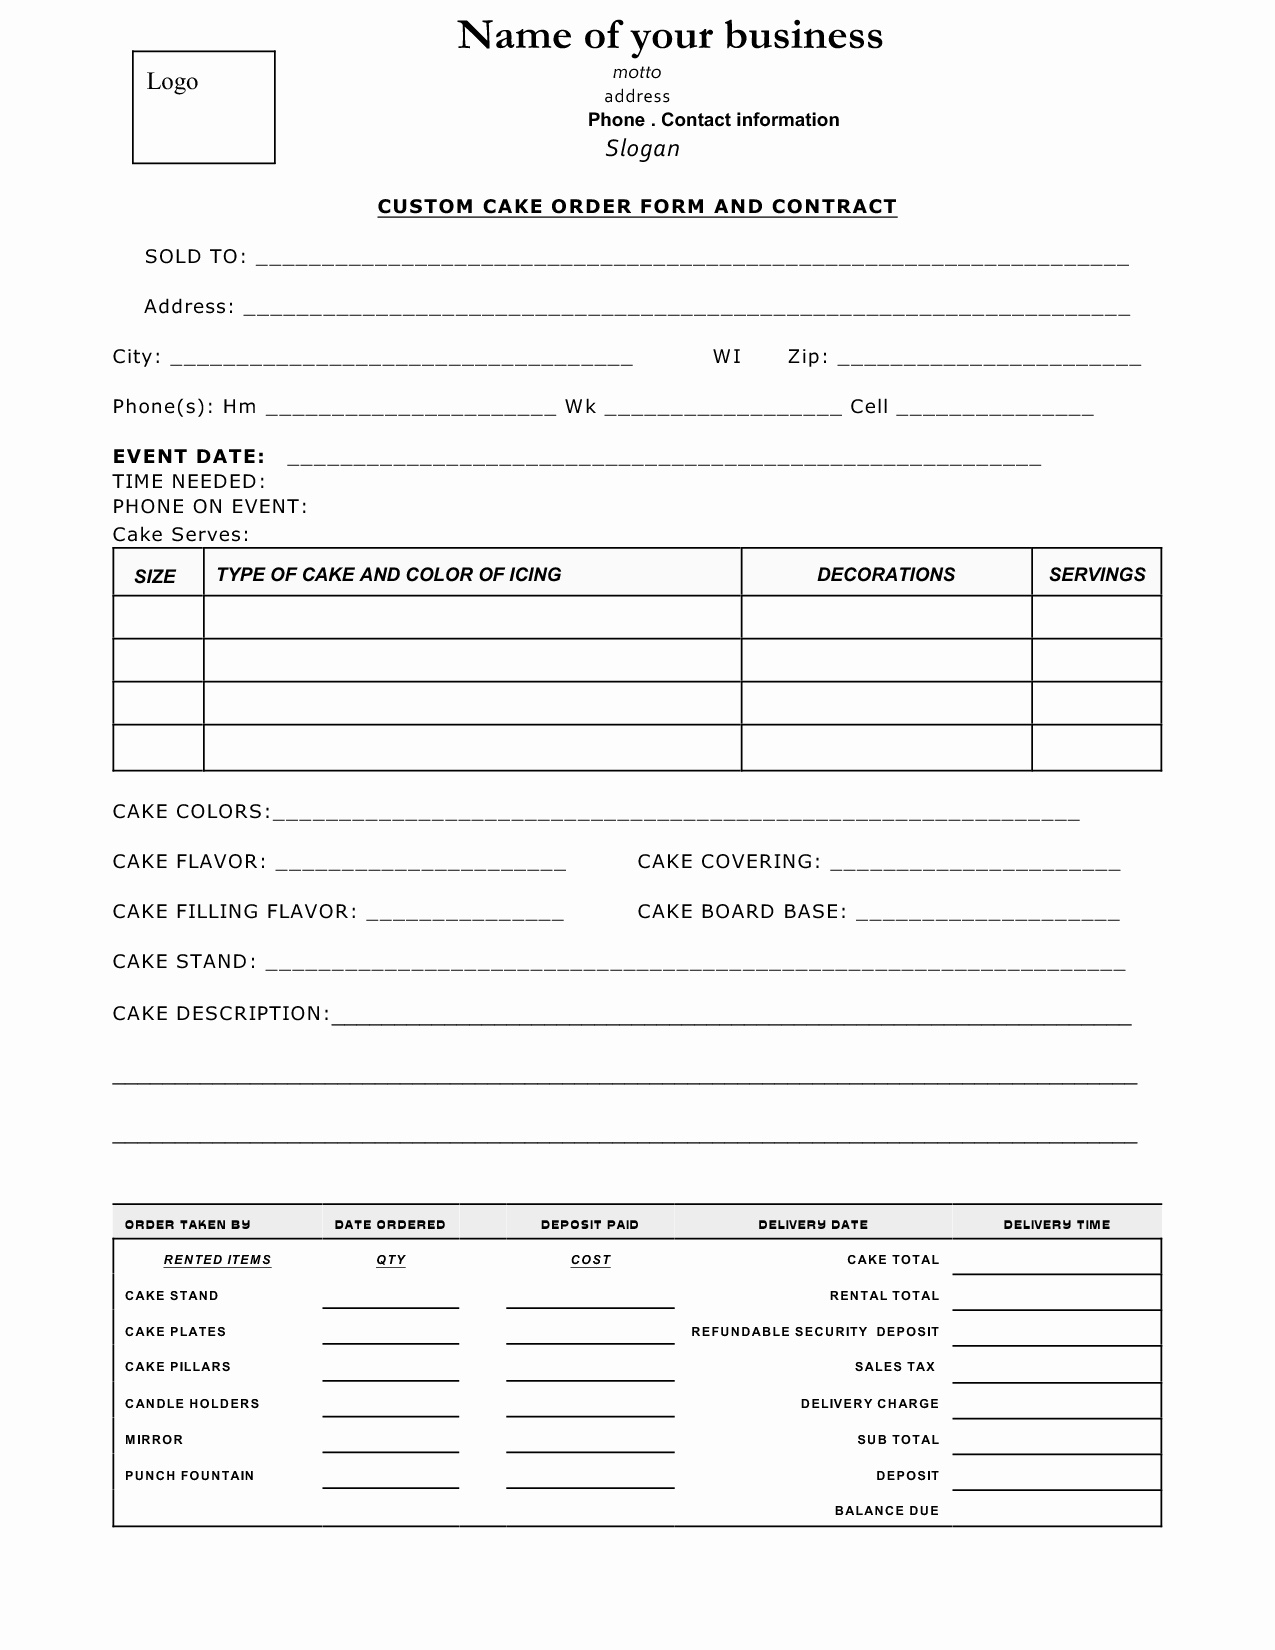 Cake order forms Printable Inspirational Cake Contract Sample Cakepins